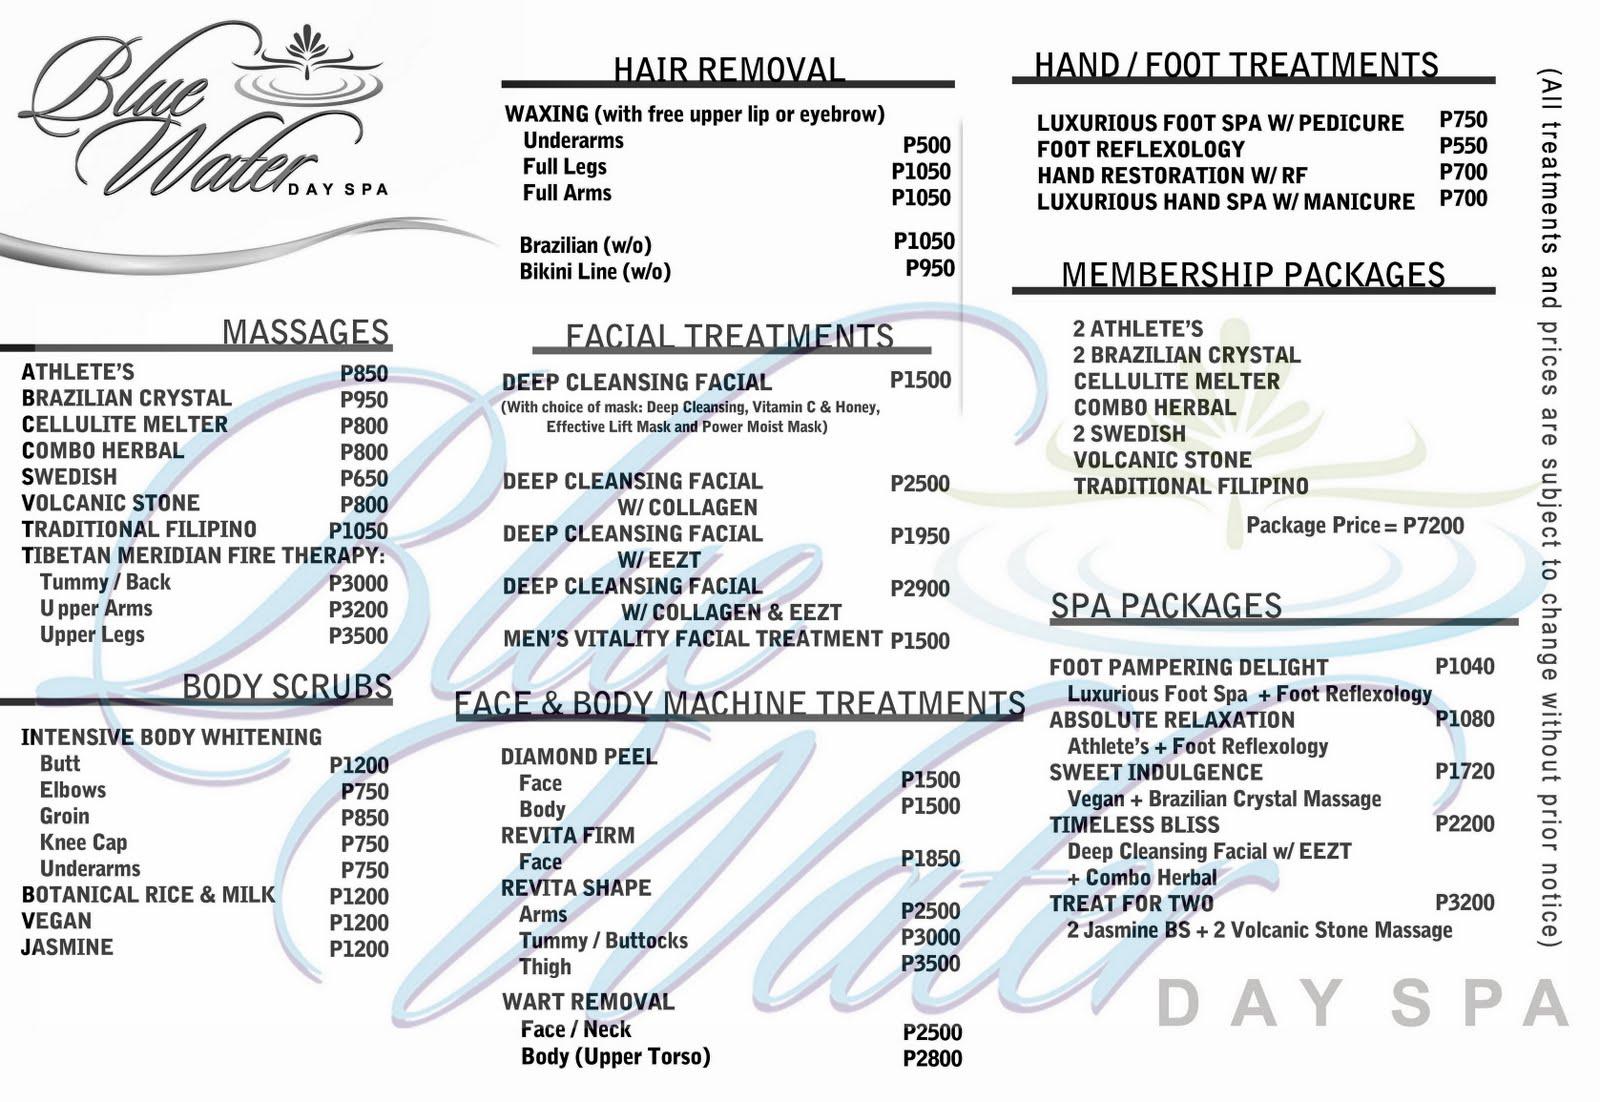 tantra massage brothel price list